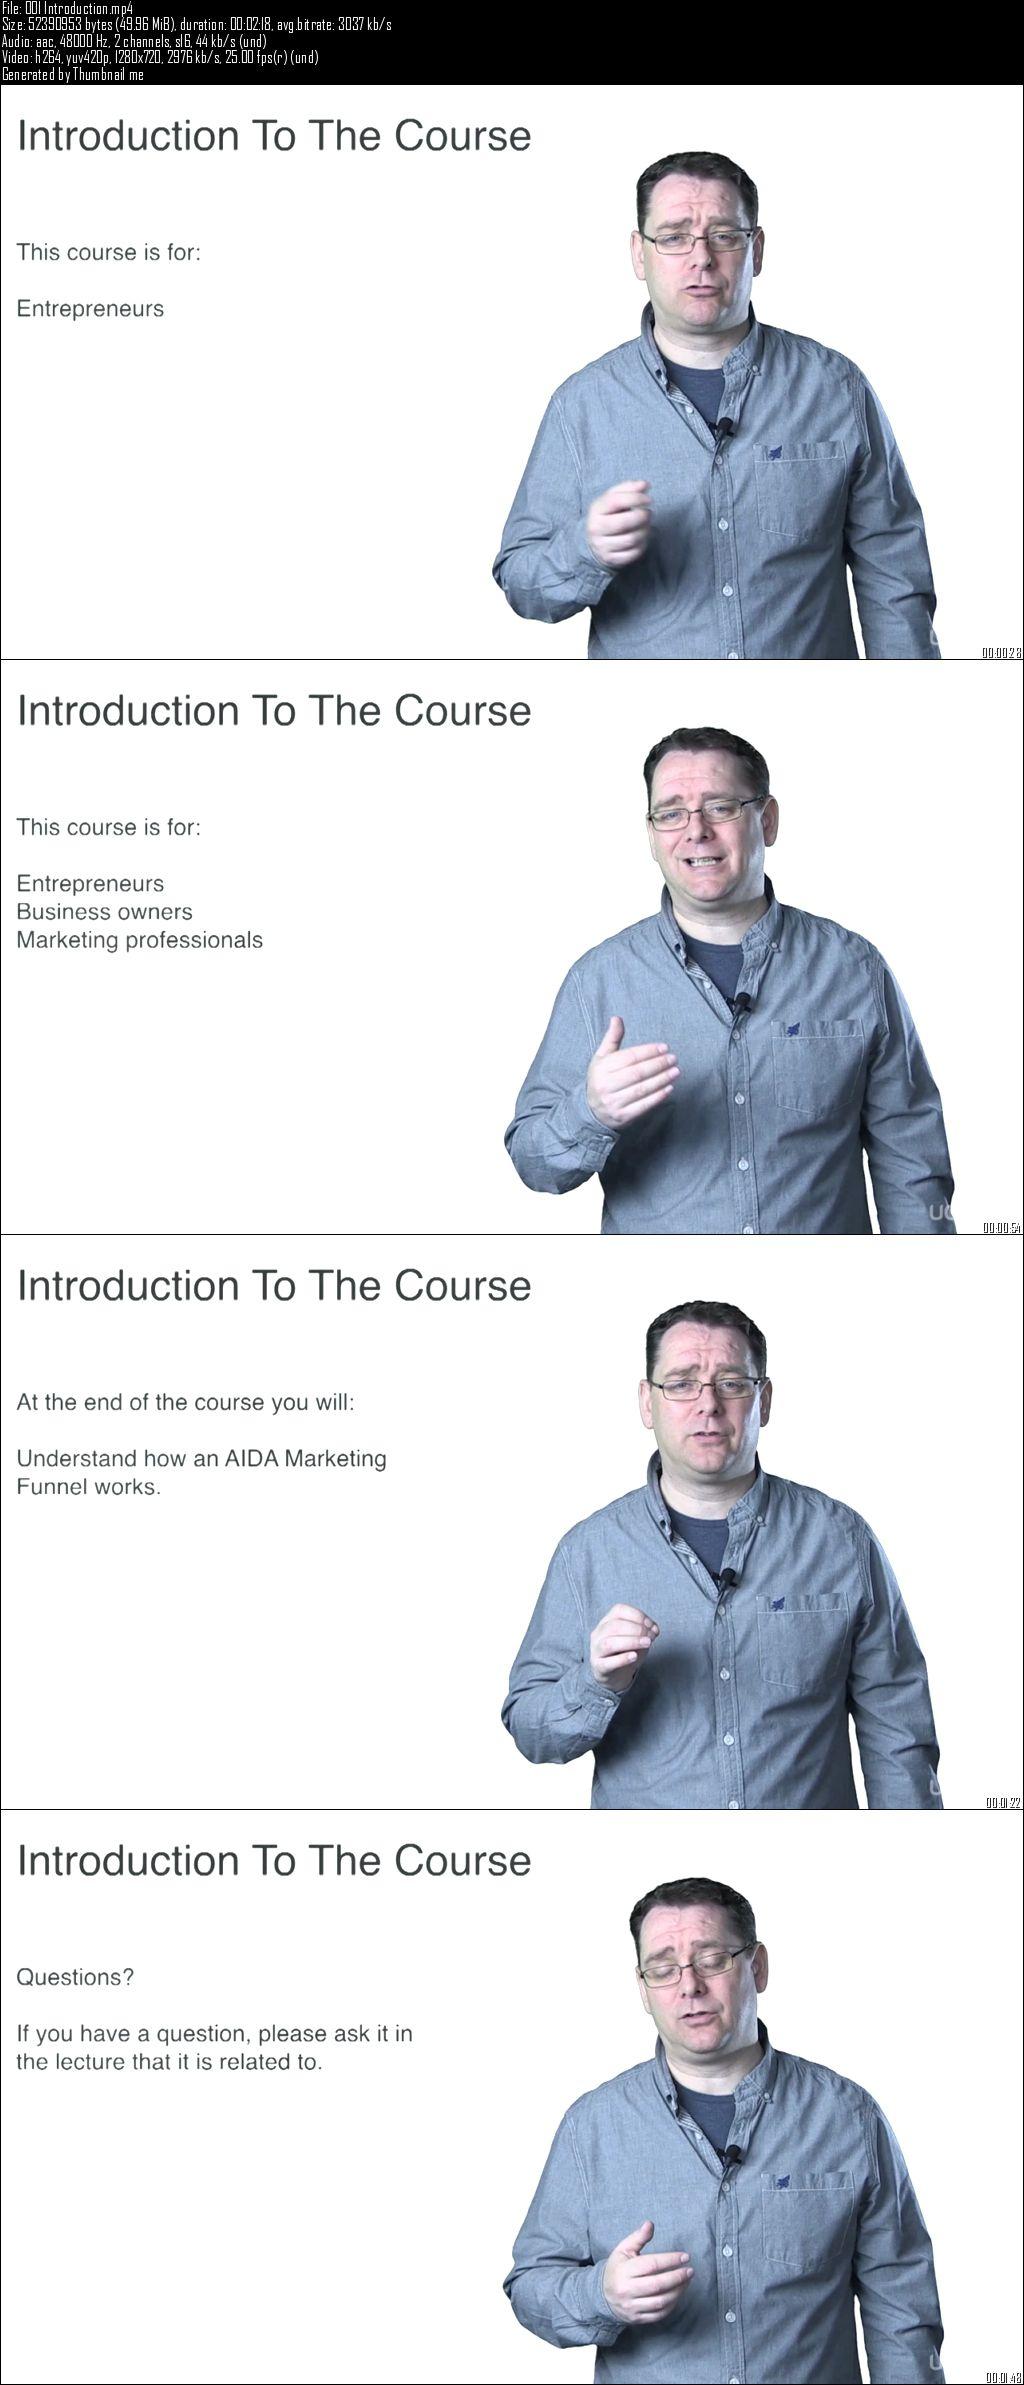 【AdOnCn.COM】001 001 Introduction - 教你如何建立电商市场中的客户管理工具 Sales Funnel(销售漏斗系统)